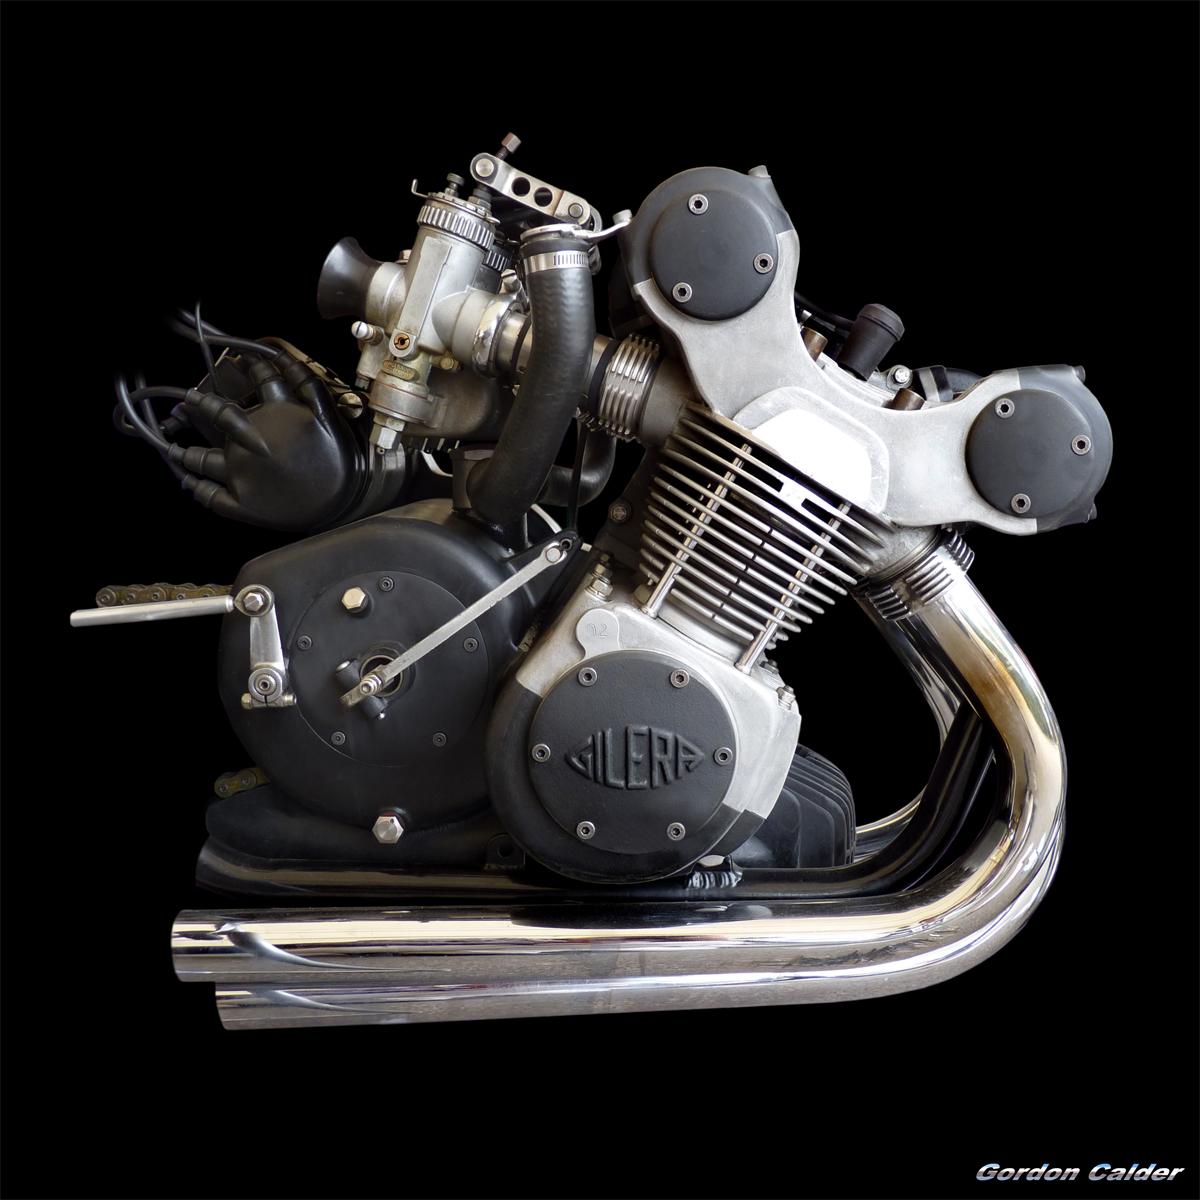 1957 gilera 500cc grand prix race bike engine   photo by gordon calder